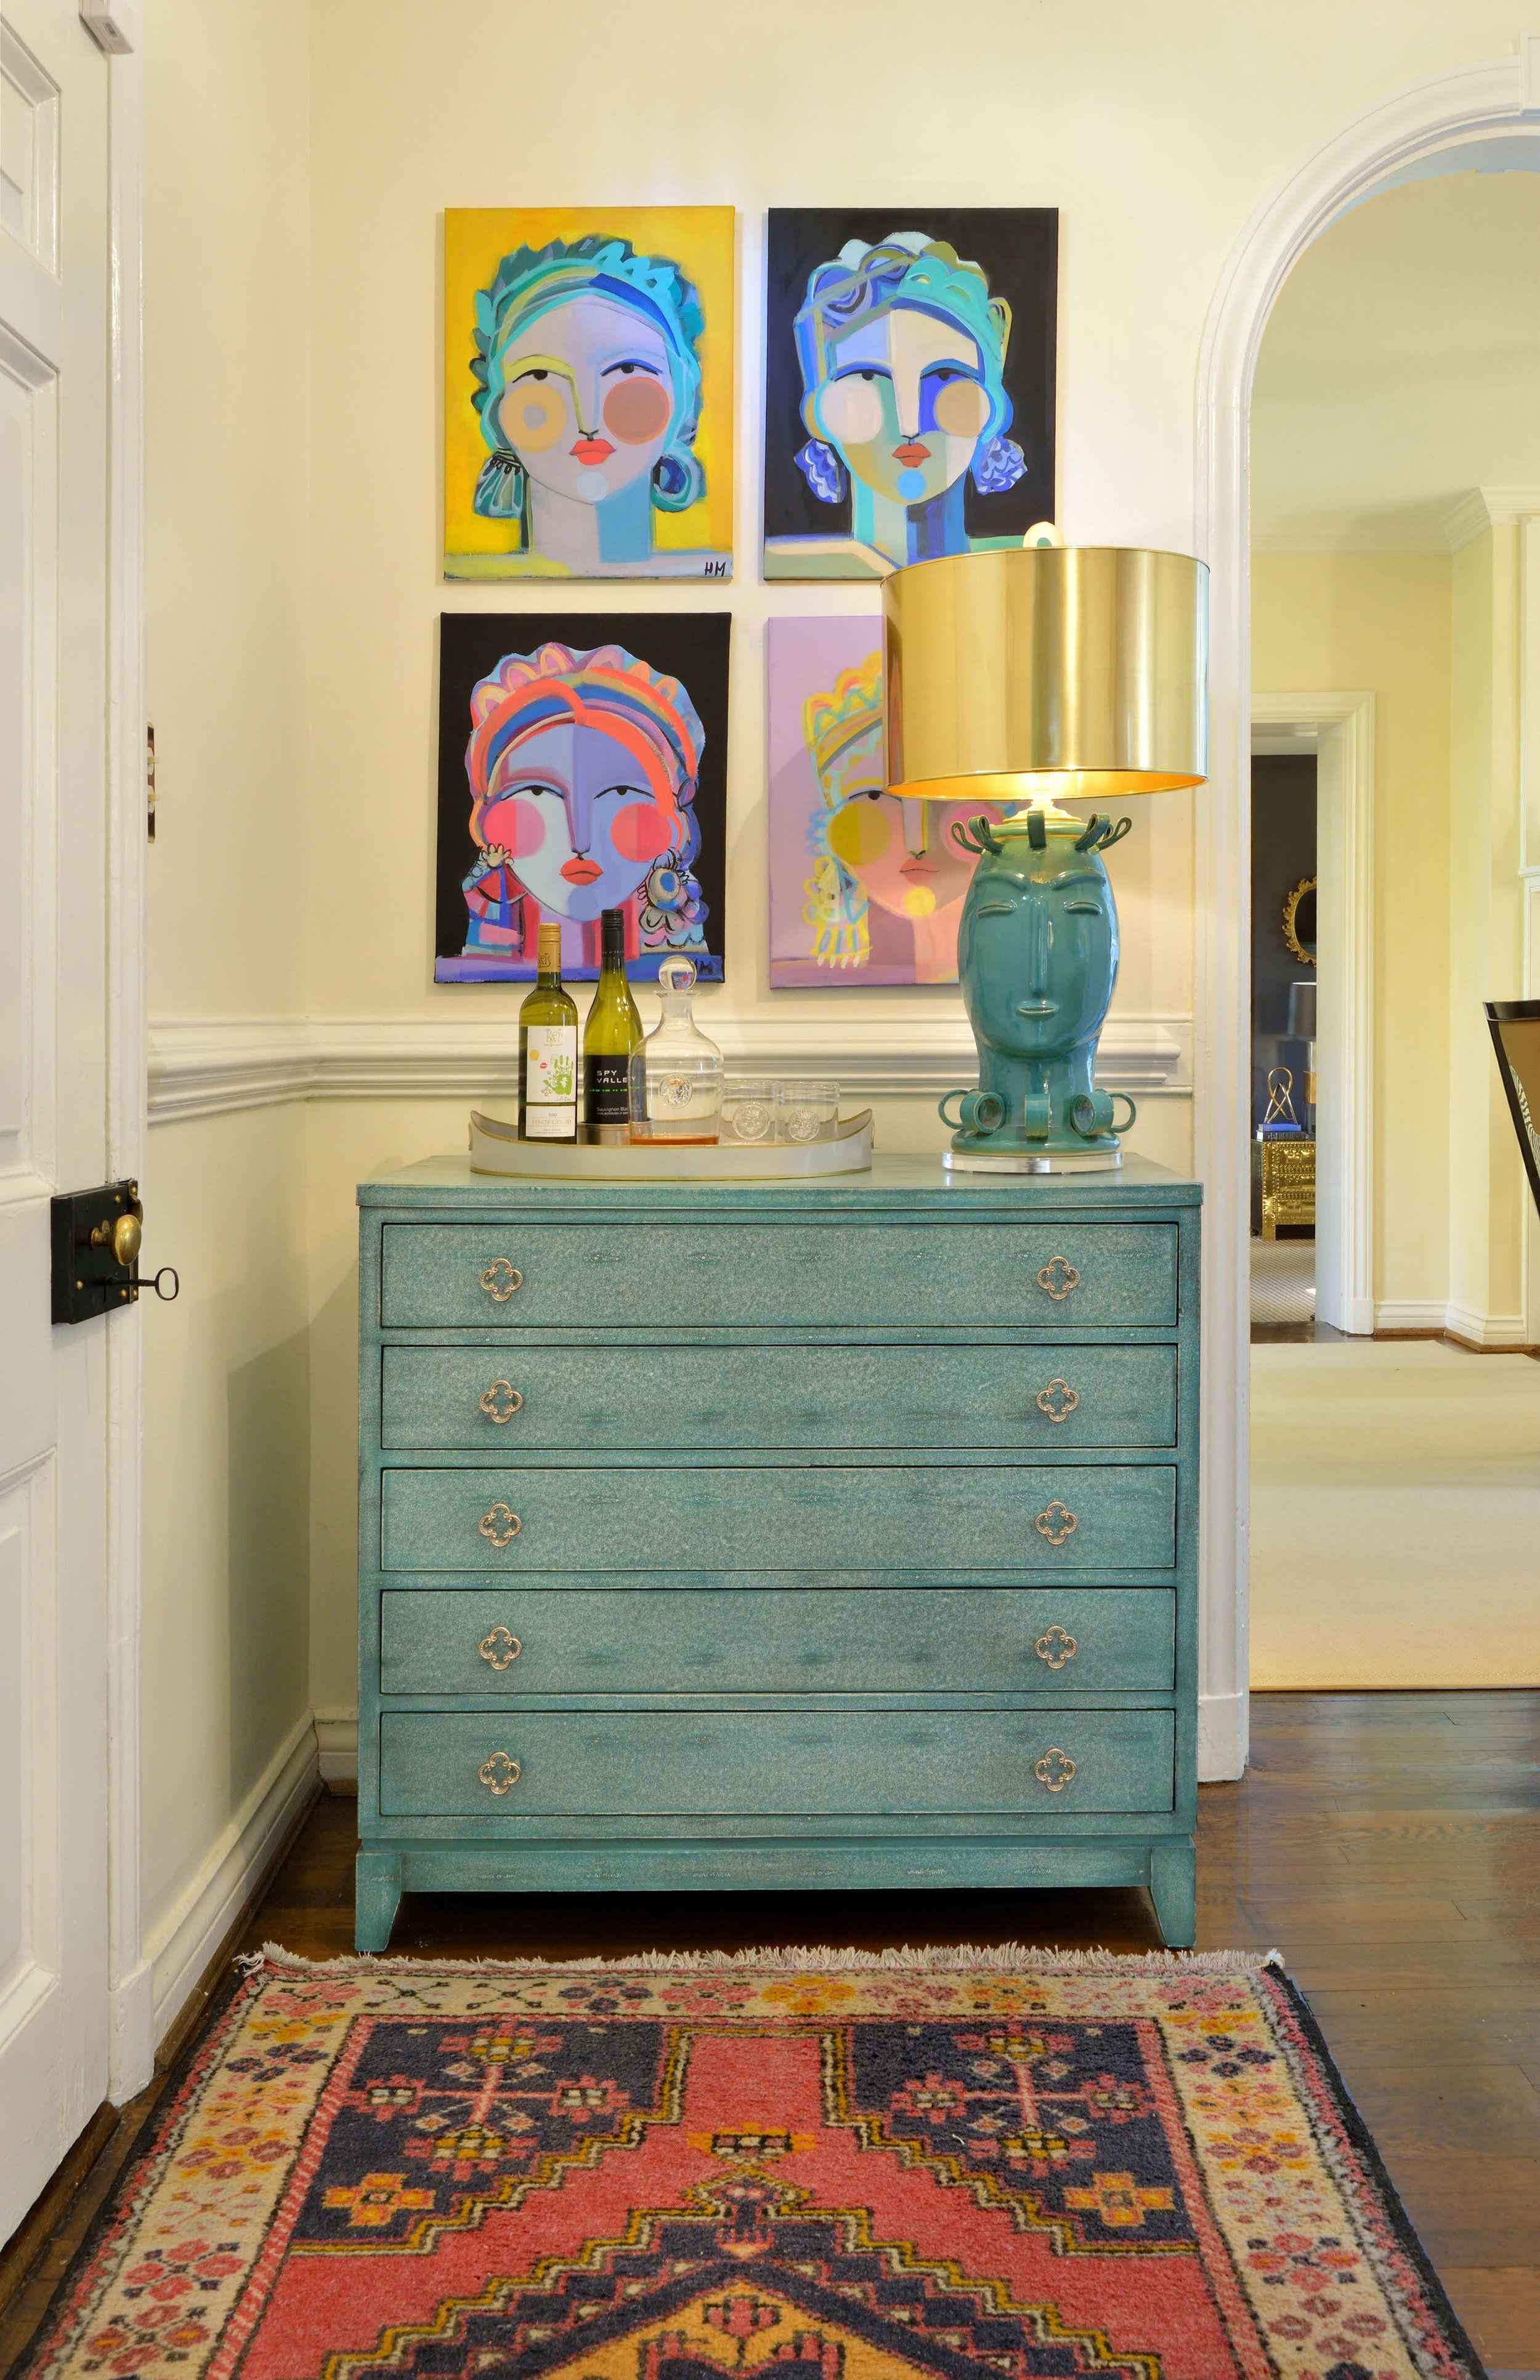 Receiving Room Interior Design: Photo Courtesy Designer Kim Childs And Photographer Barry